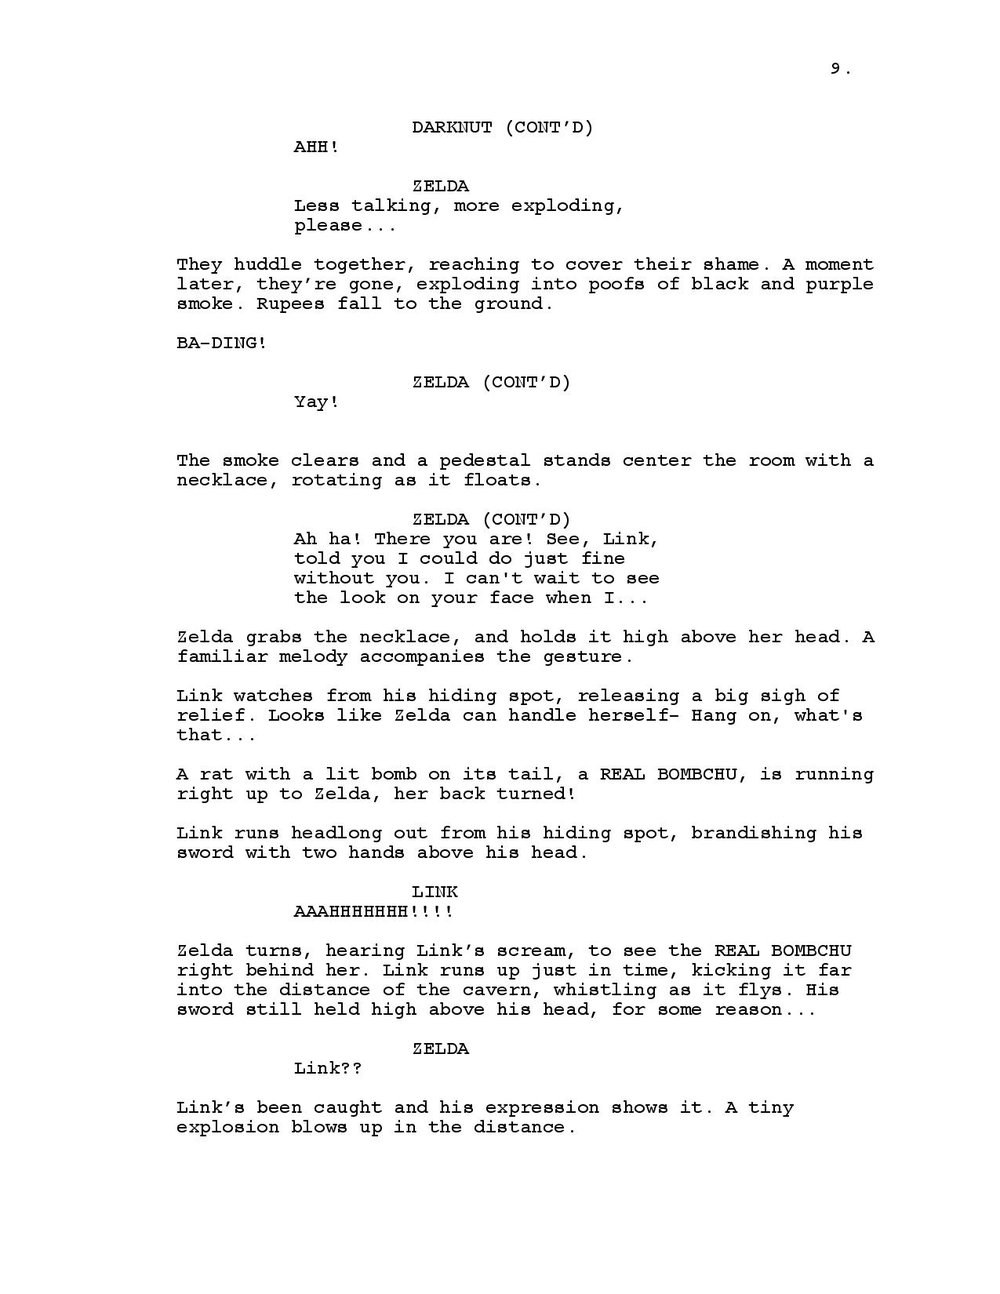 TheAdventuresofZelda&Link_Pilot-page-009.jpg